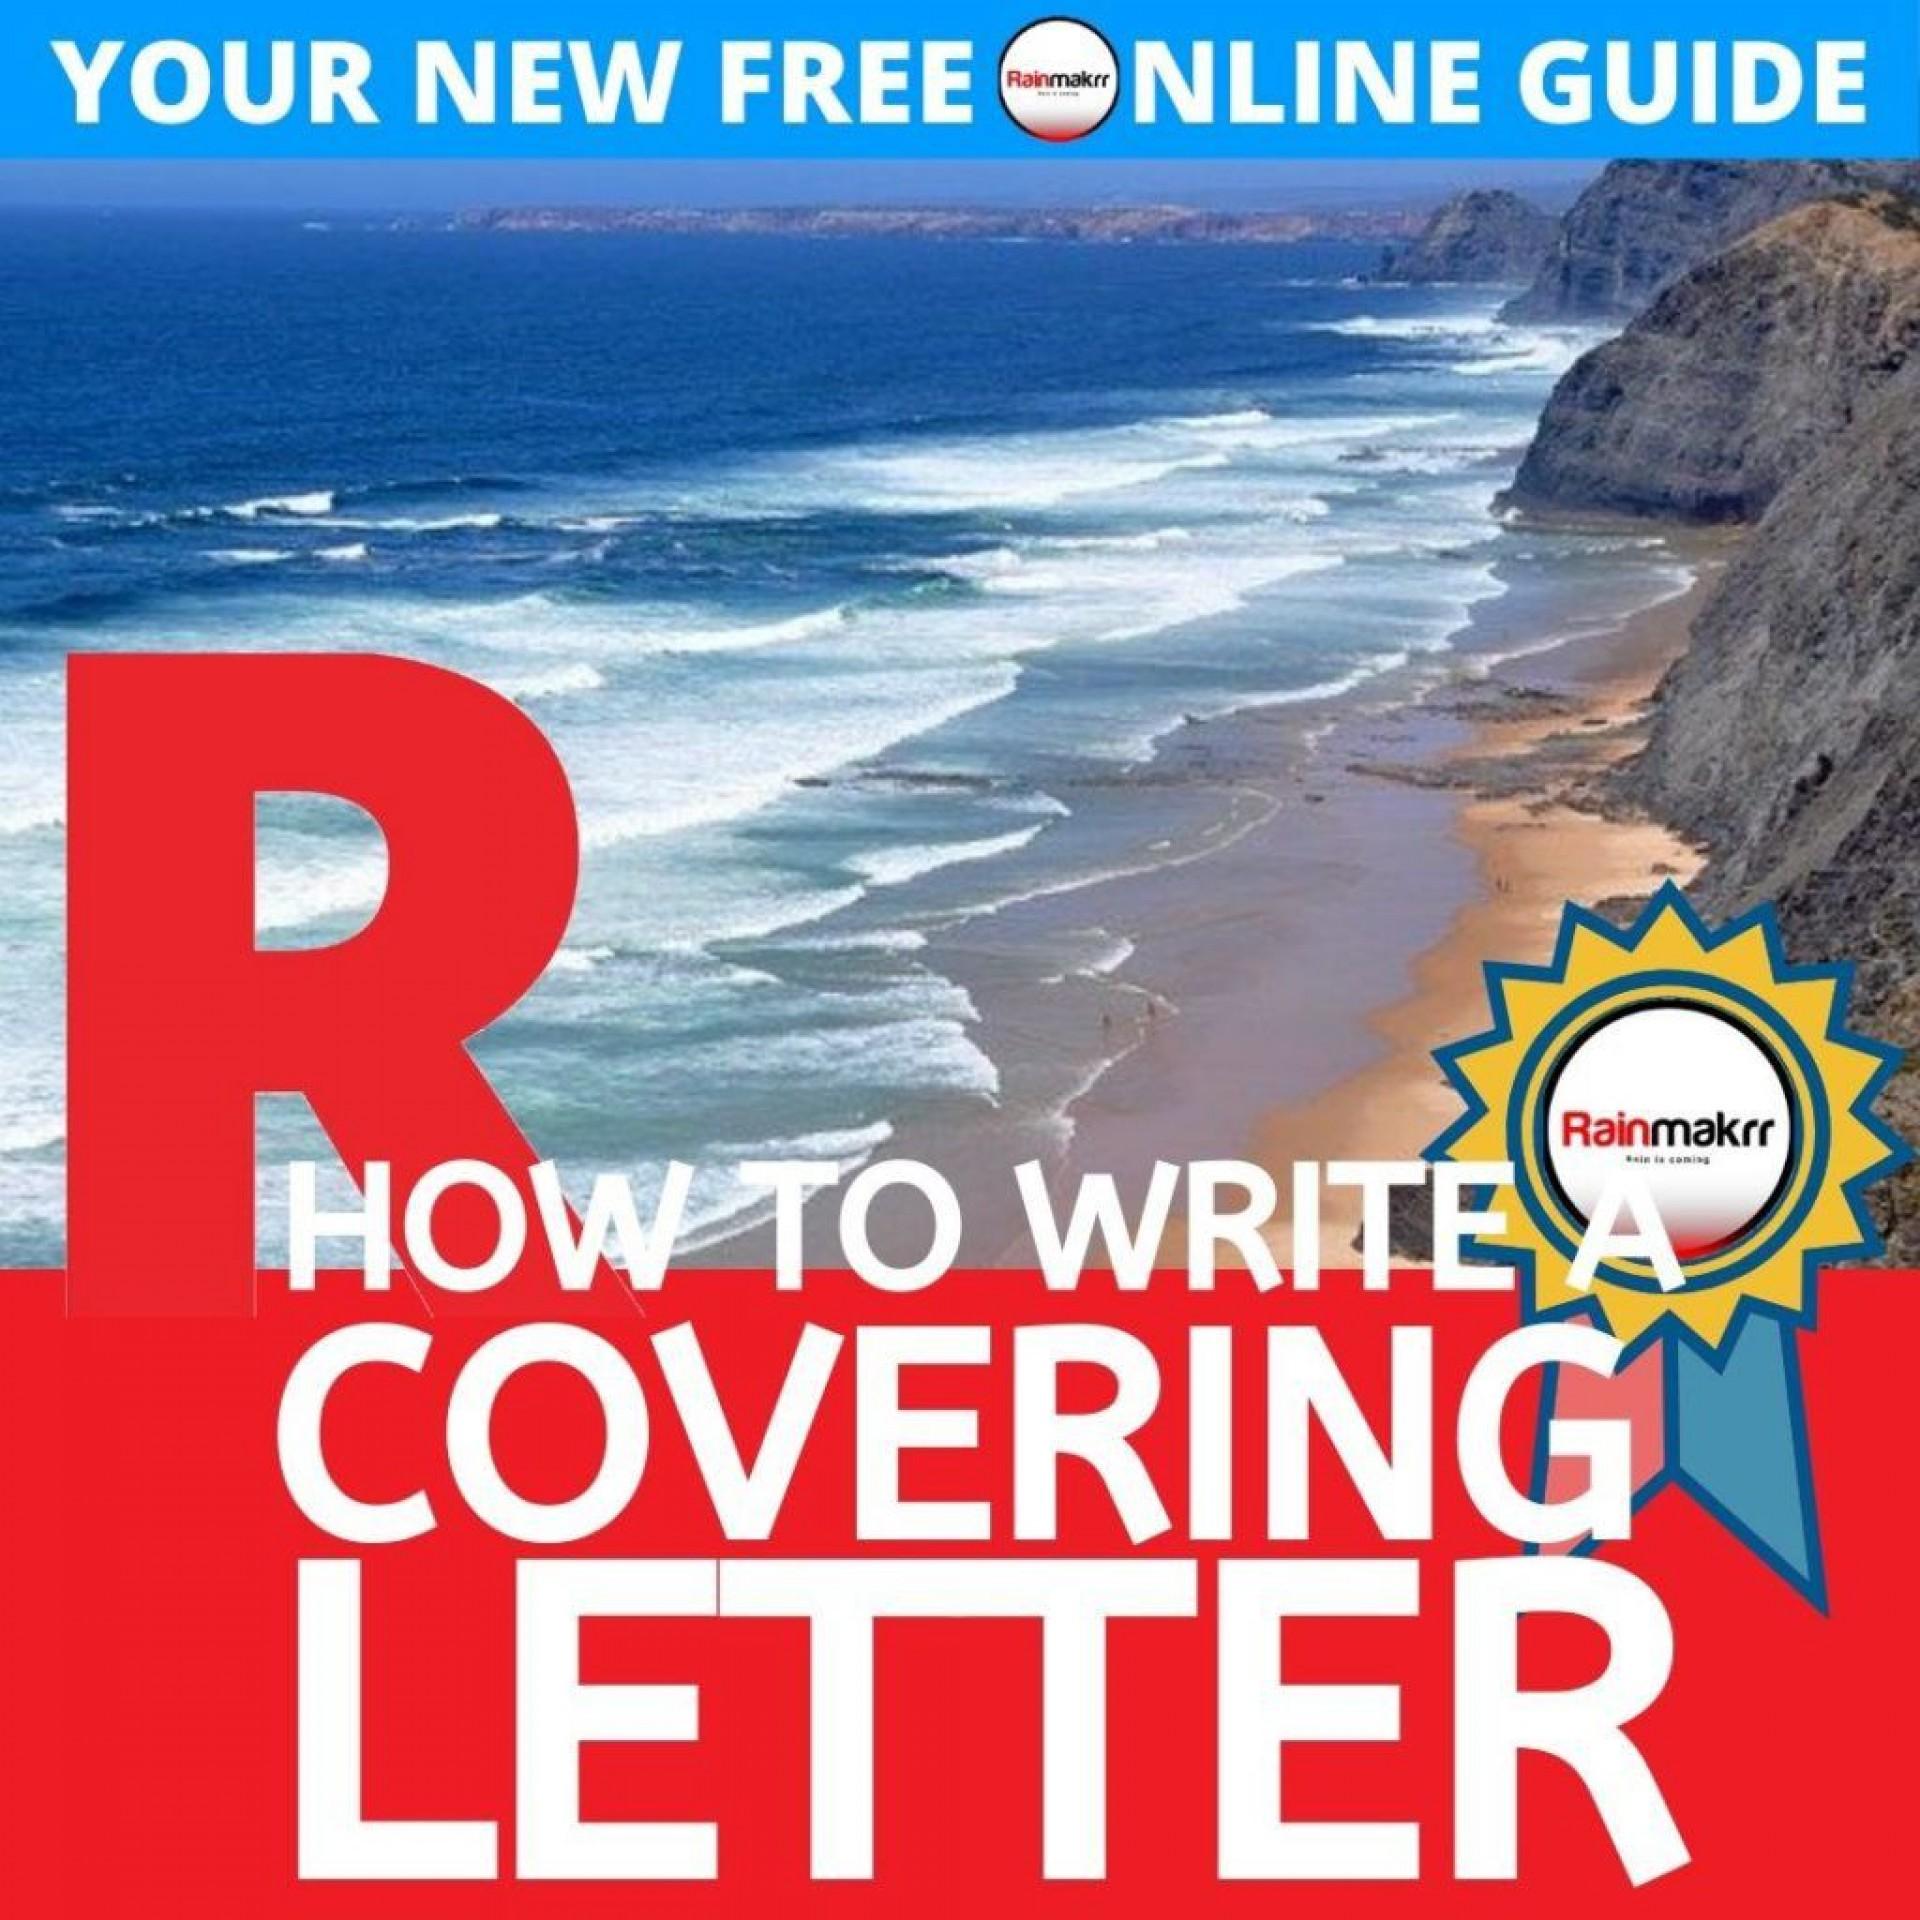 003 Fantastic Covering Letter Example Uk Photo  Graduate Executive 20191920